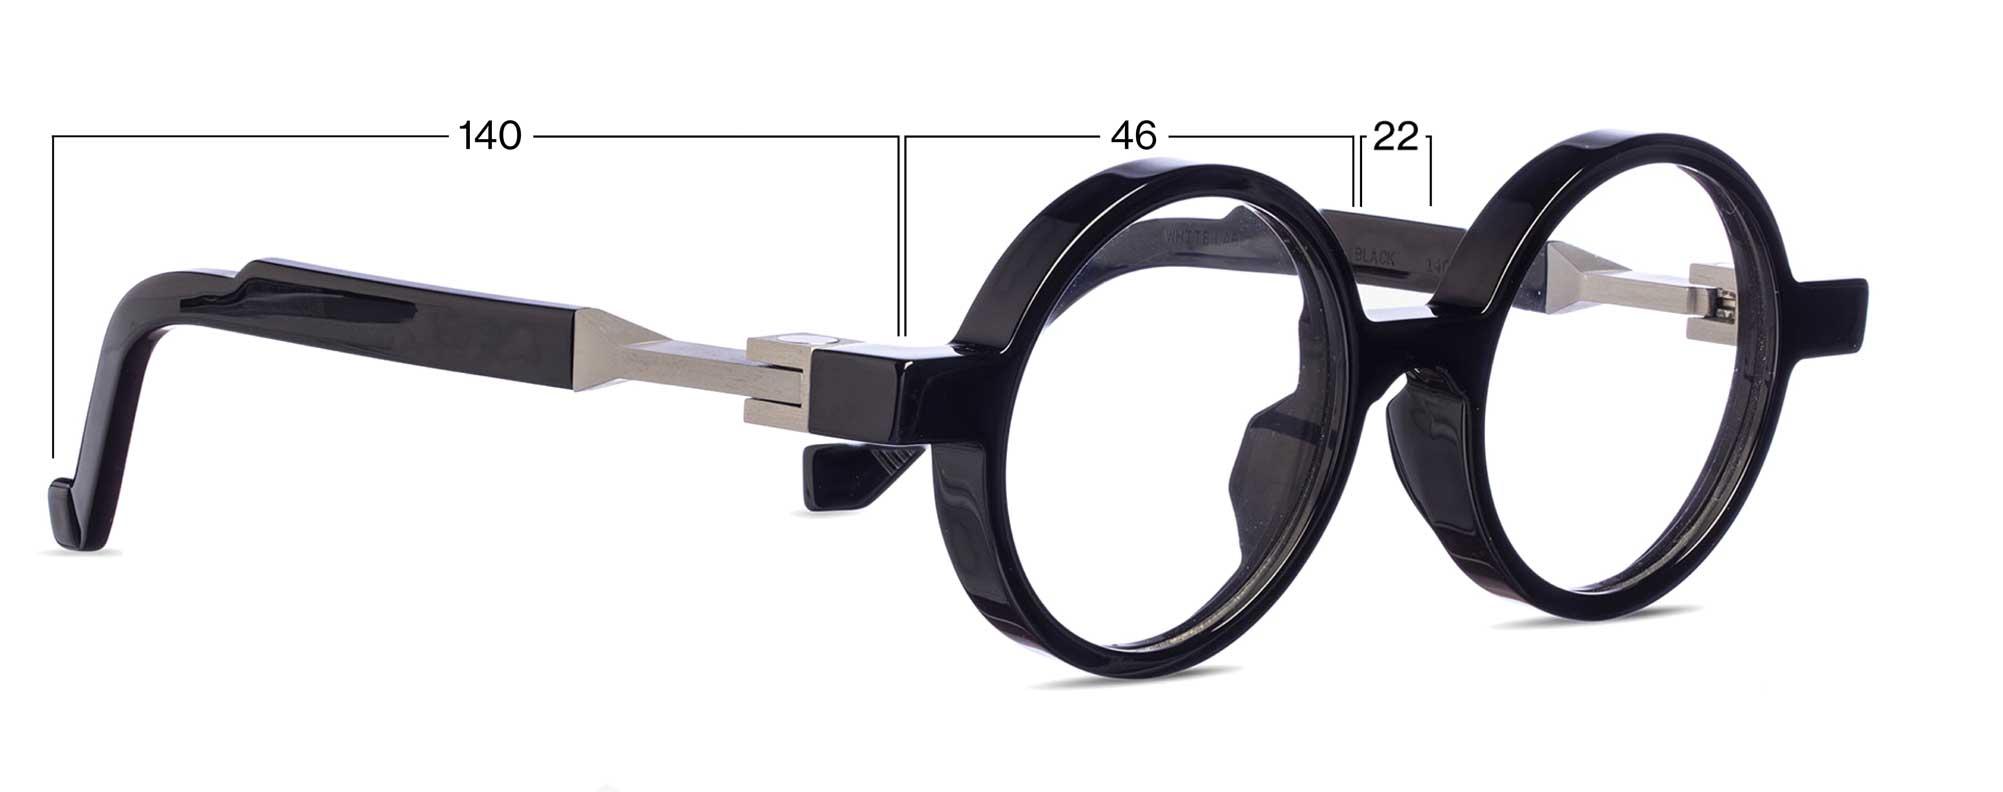 vava eyewear wl0008 sizing round